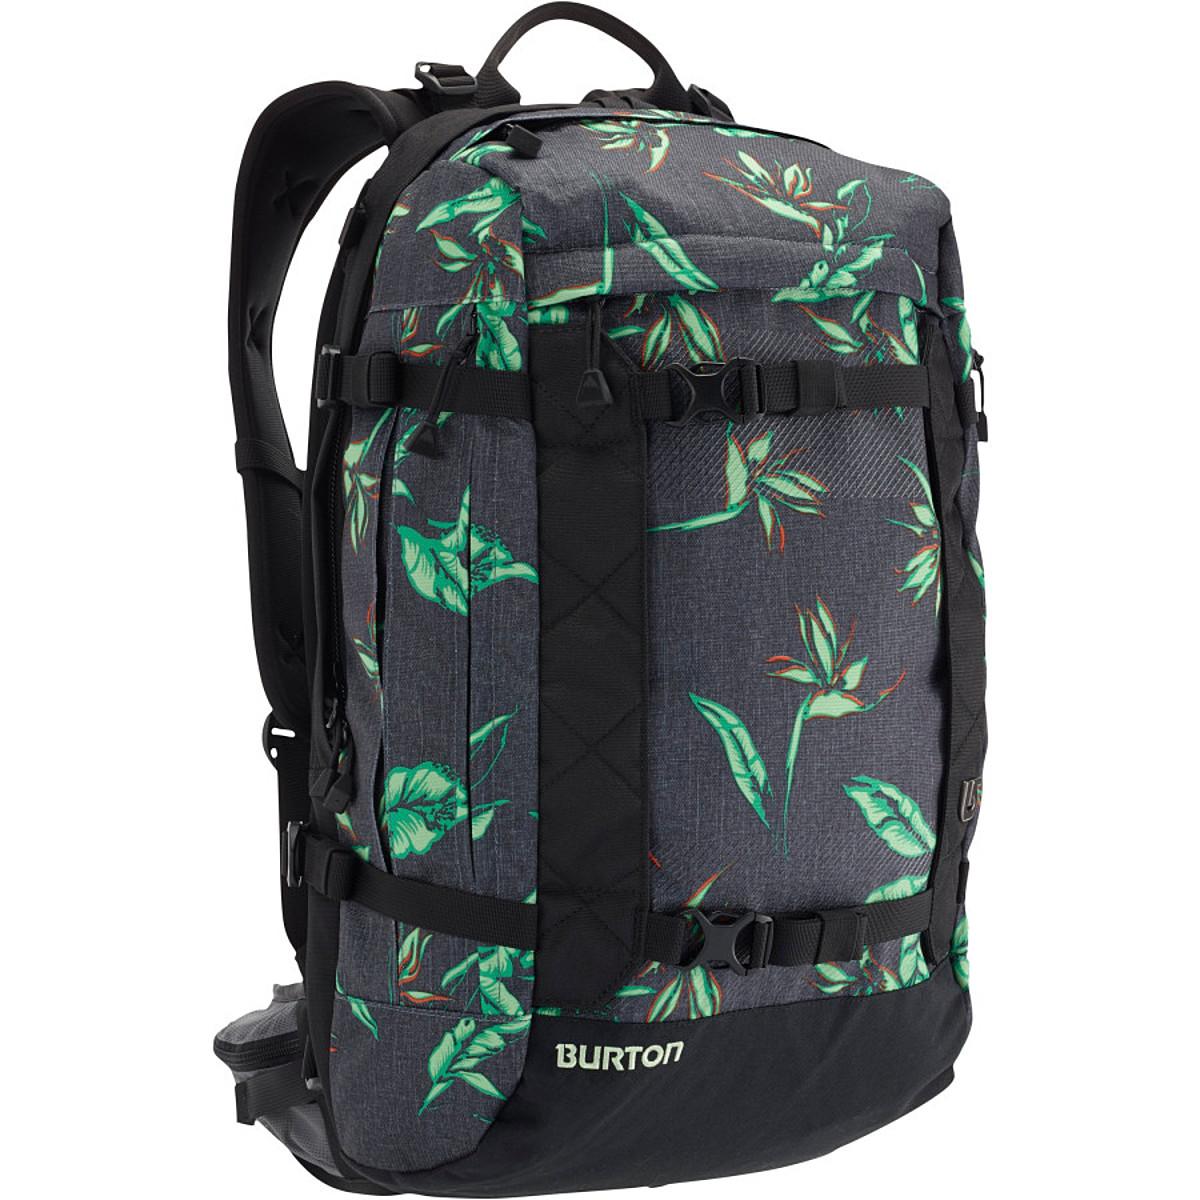 Burton Rider's 25L Pack